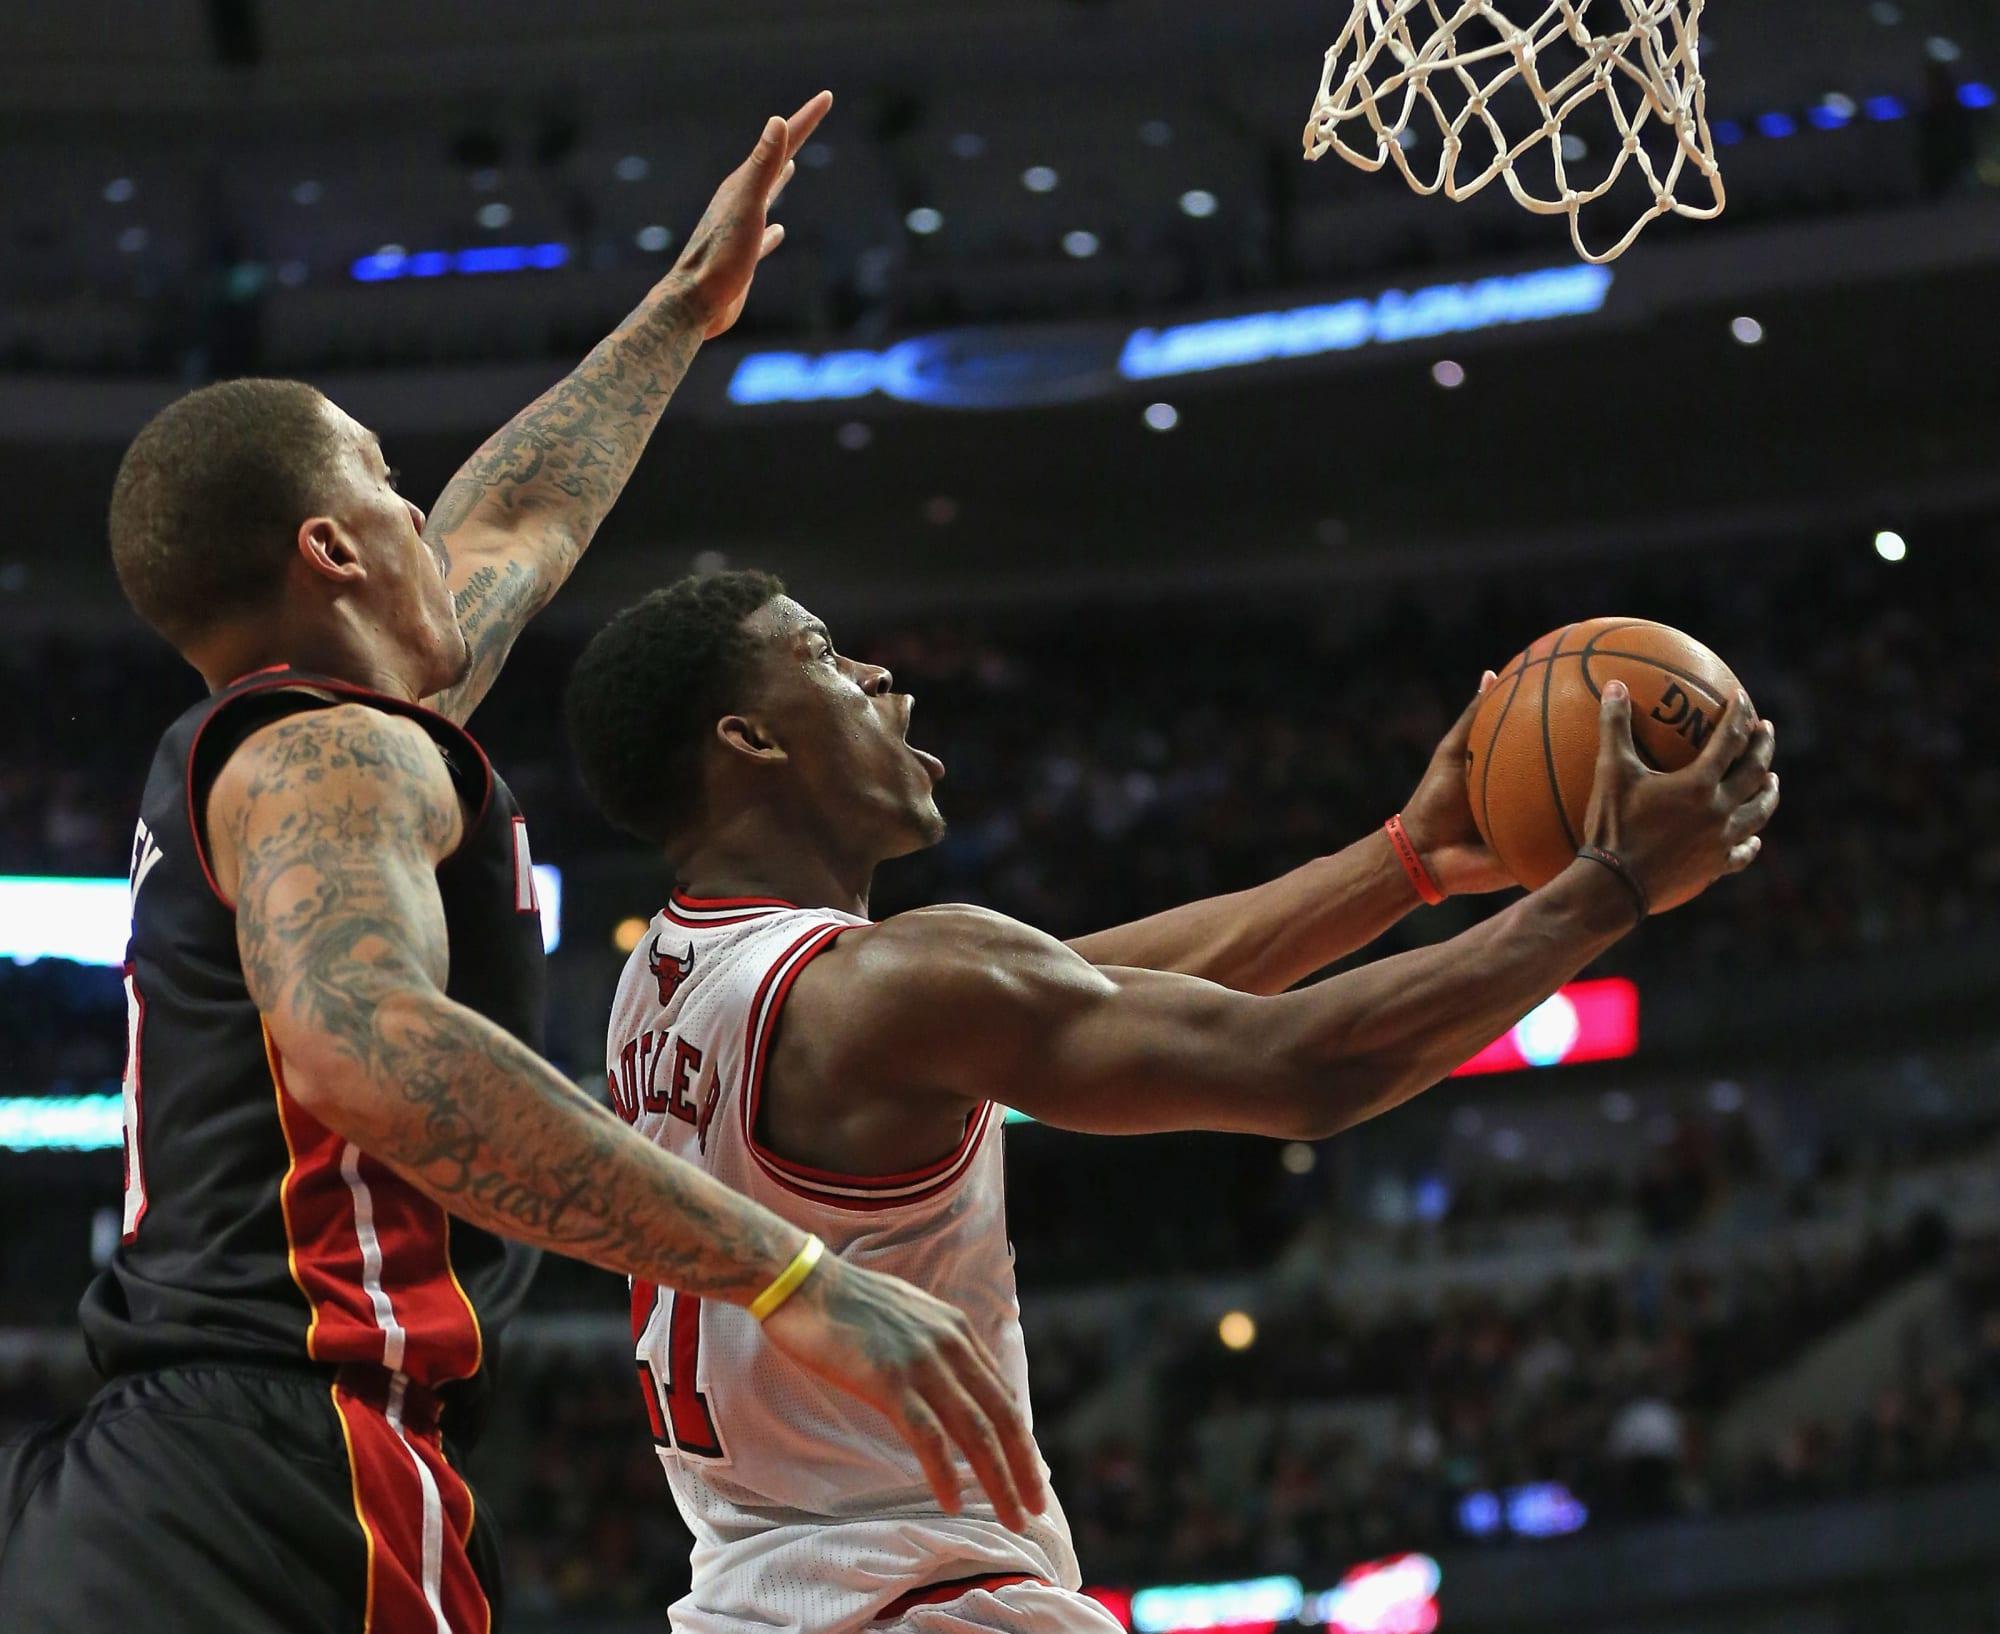 Miami Heat: So, no one needs a Michael Beasley huh?